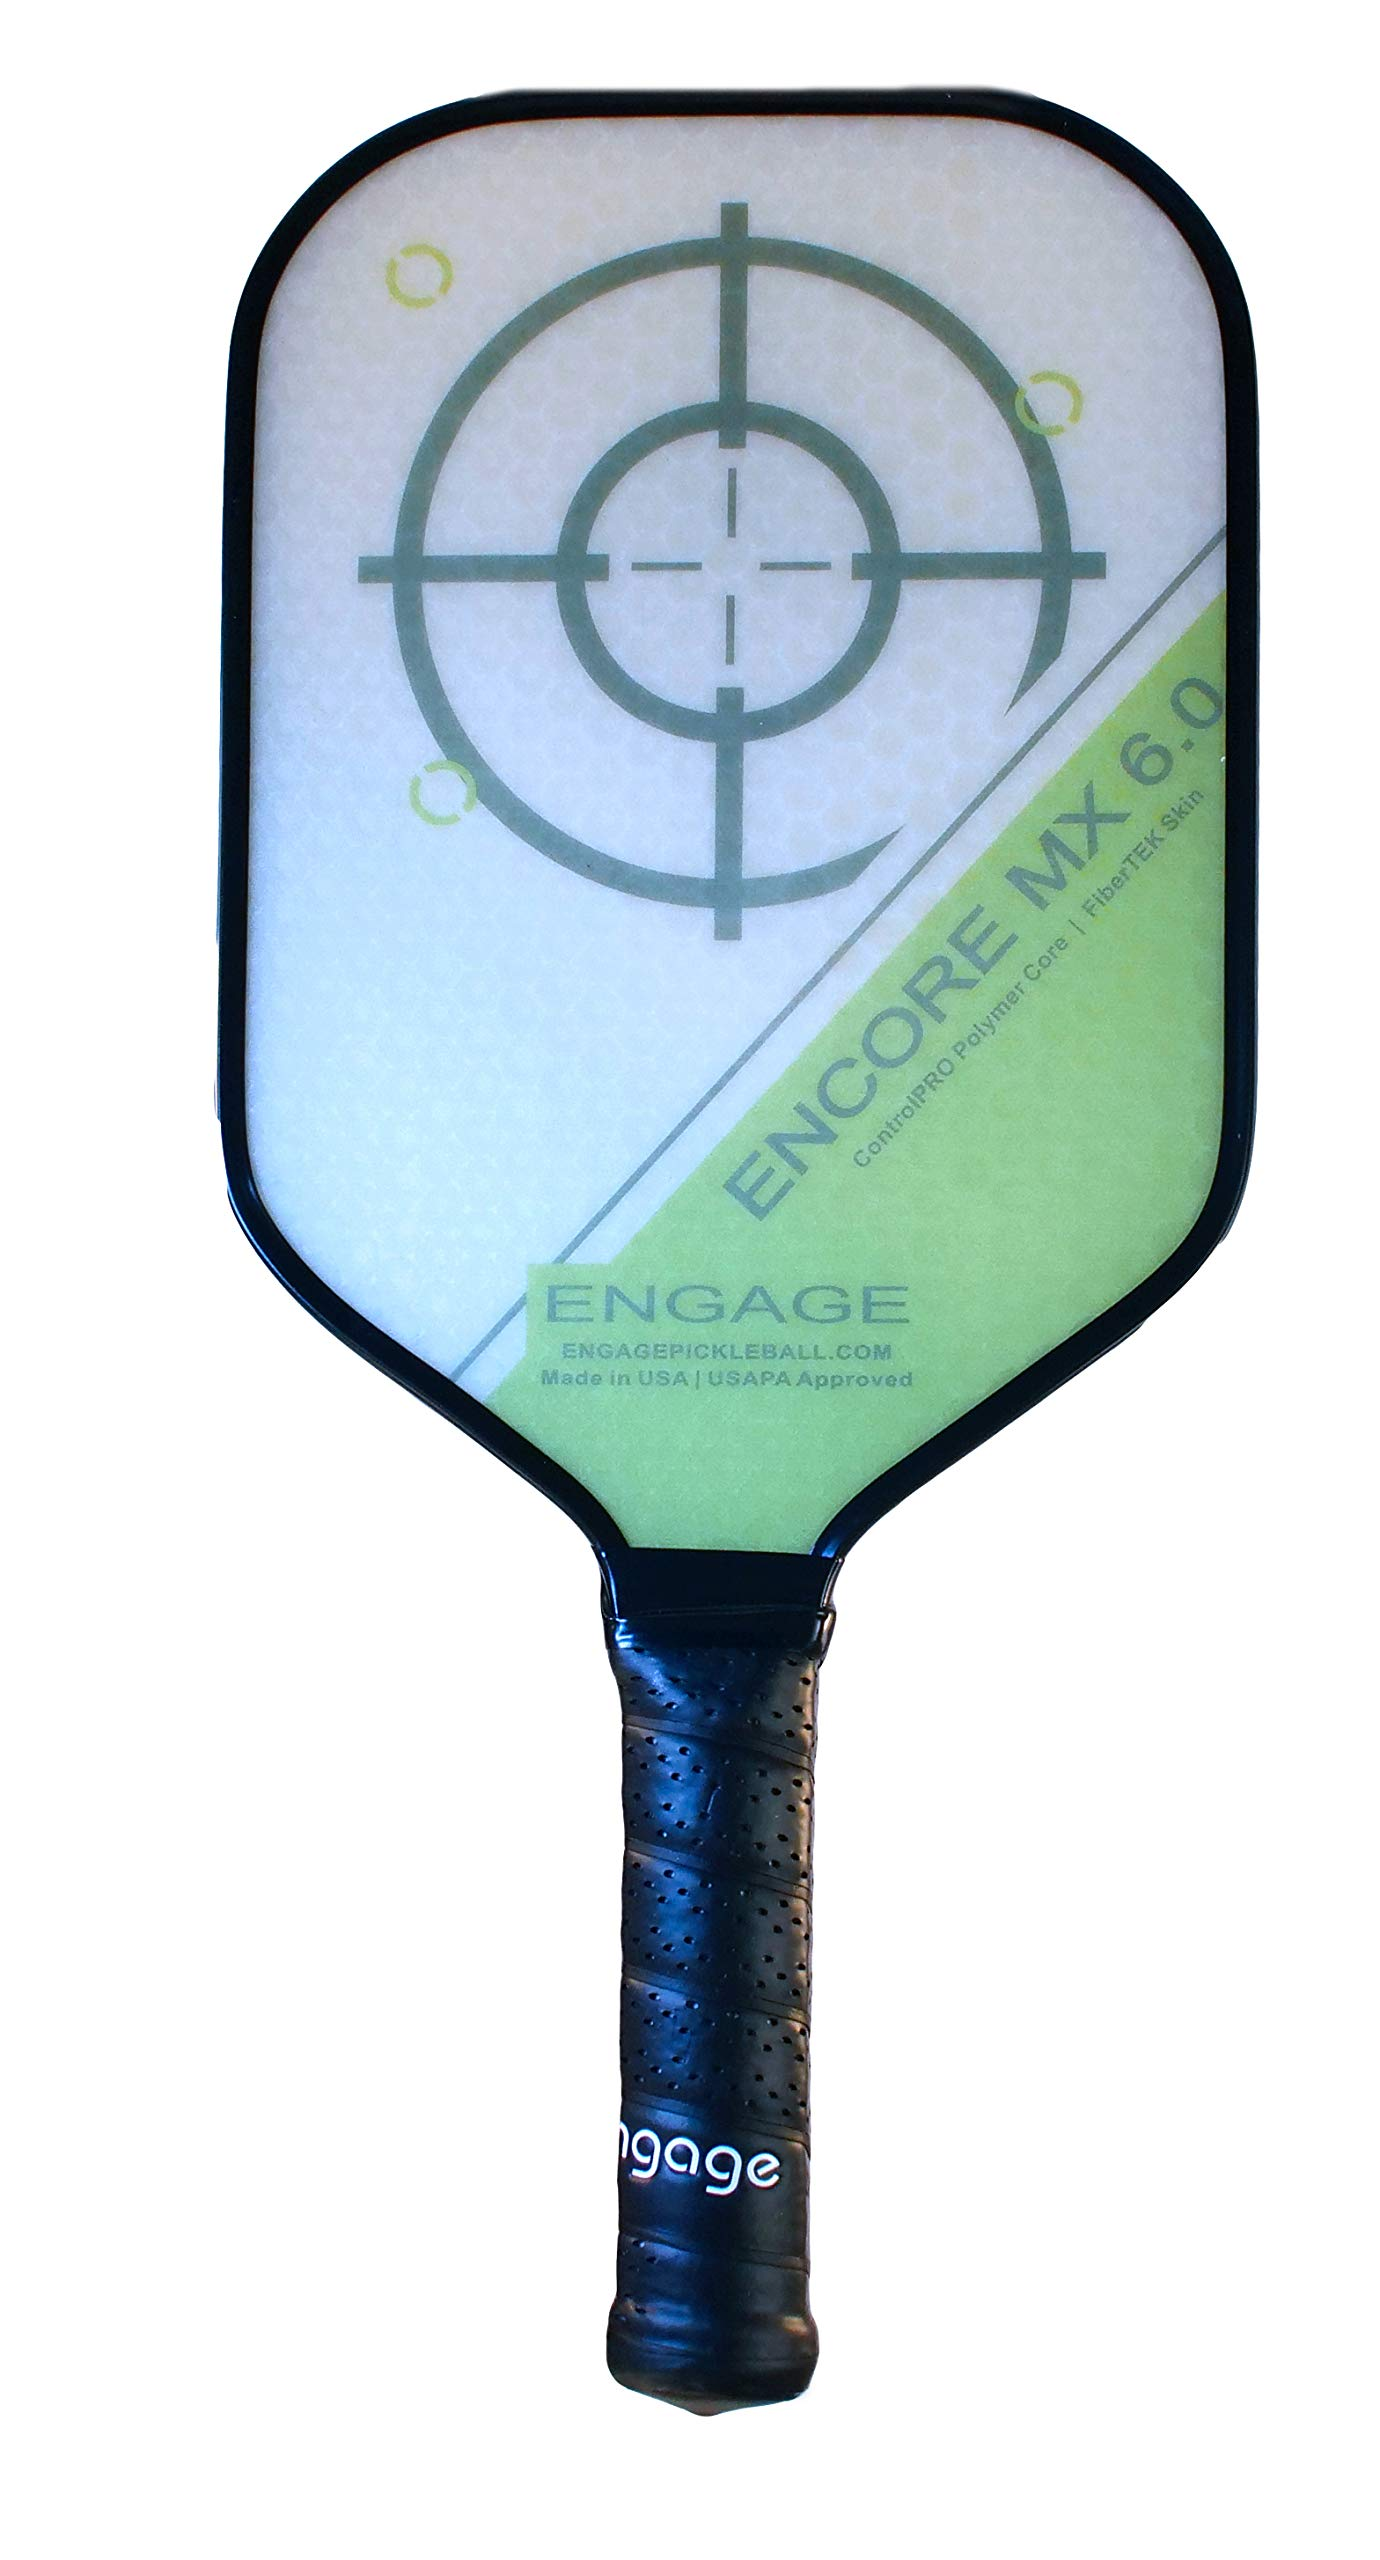 Encore MX 6.0 Pickleball Paddle Standard Weight 7.9-8.3 oz R